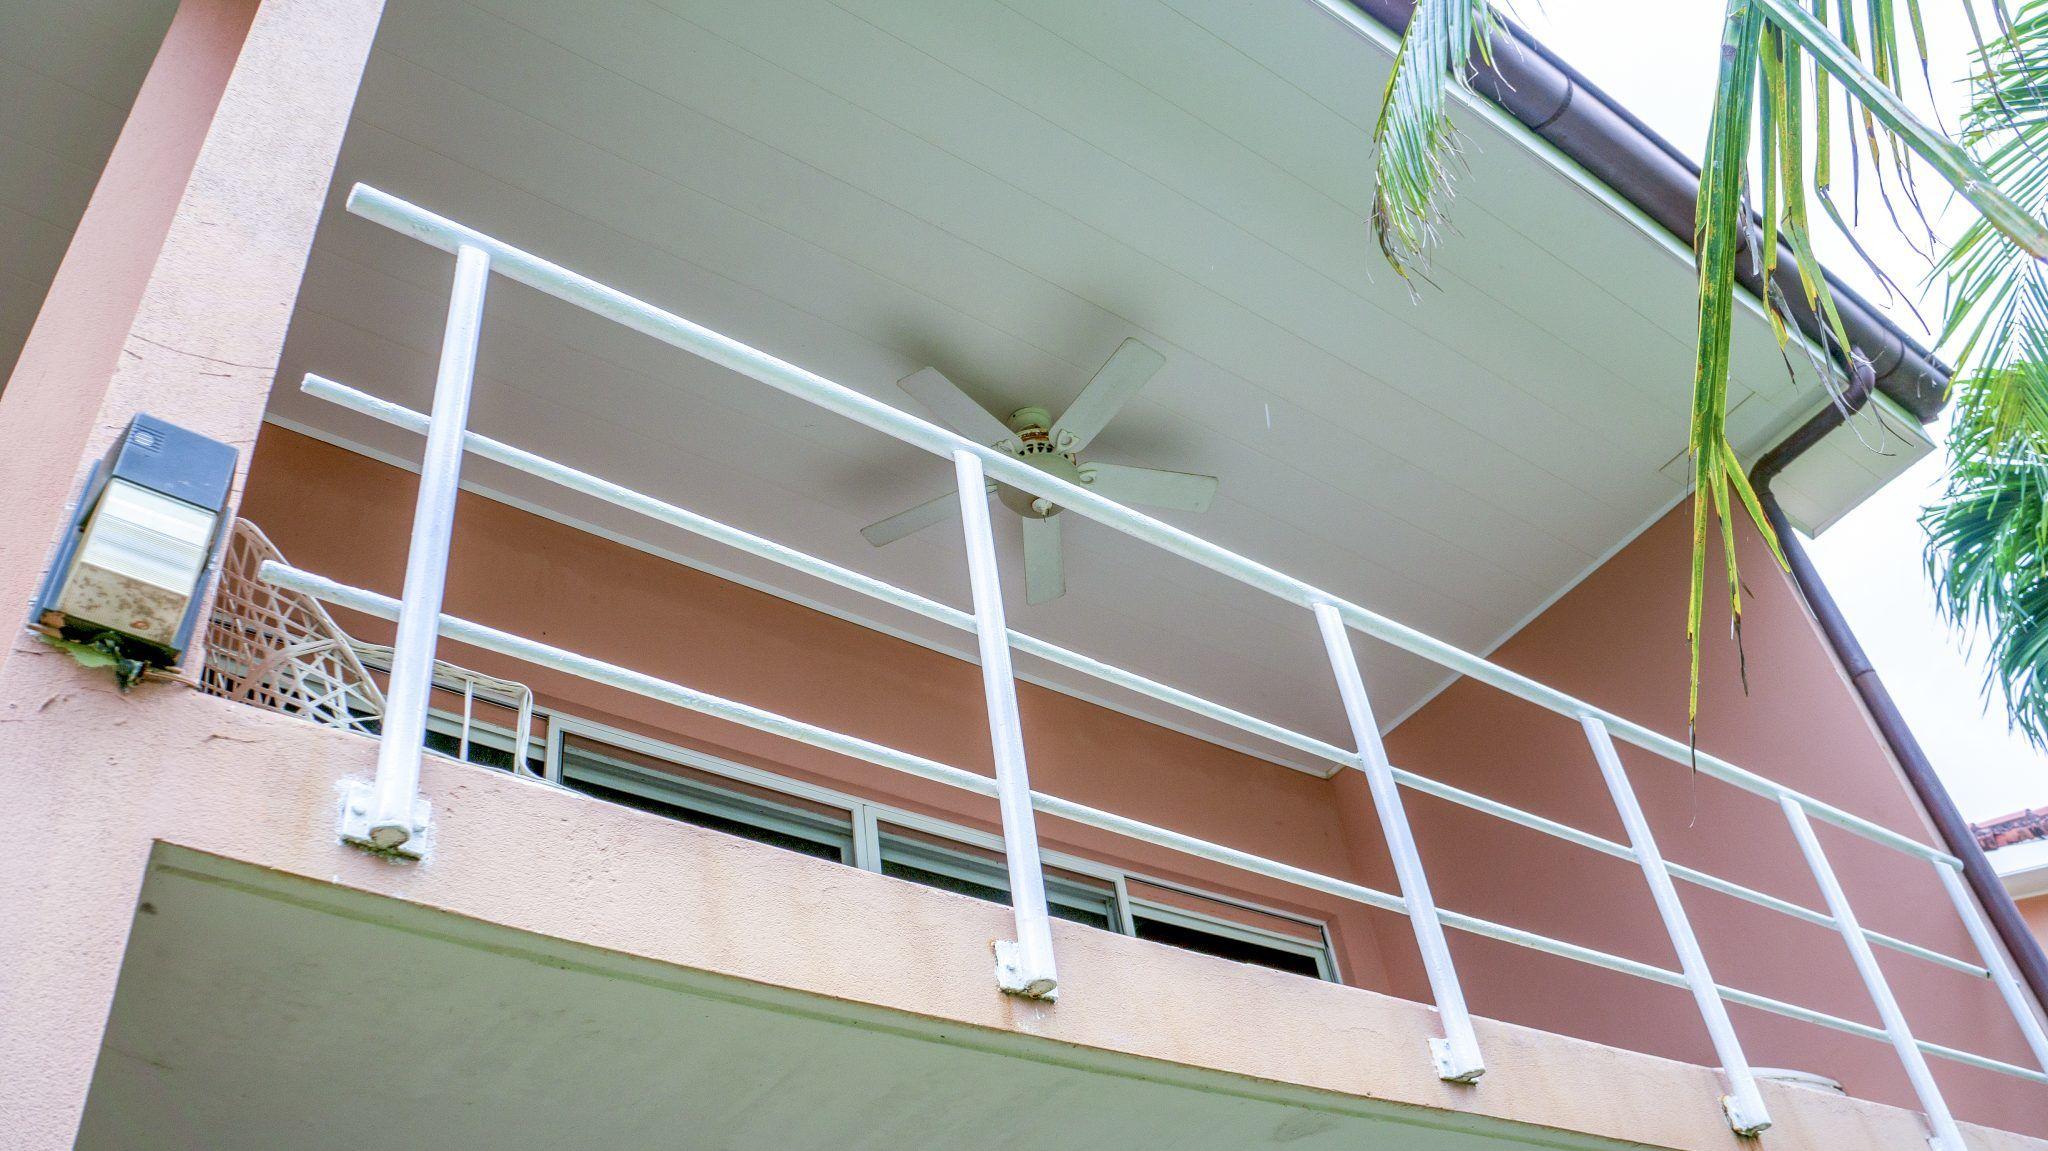 BL30 - Balcony